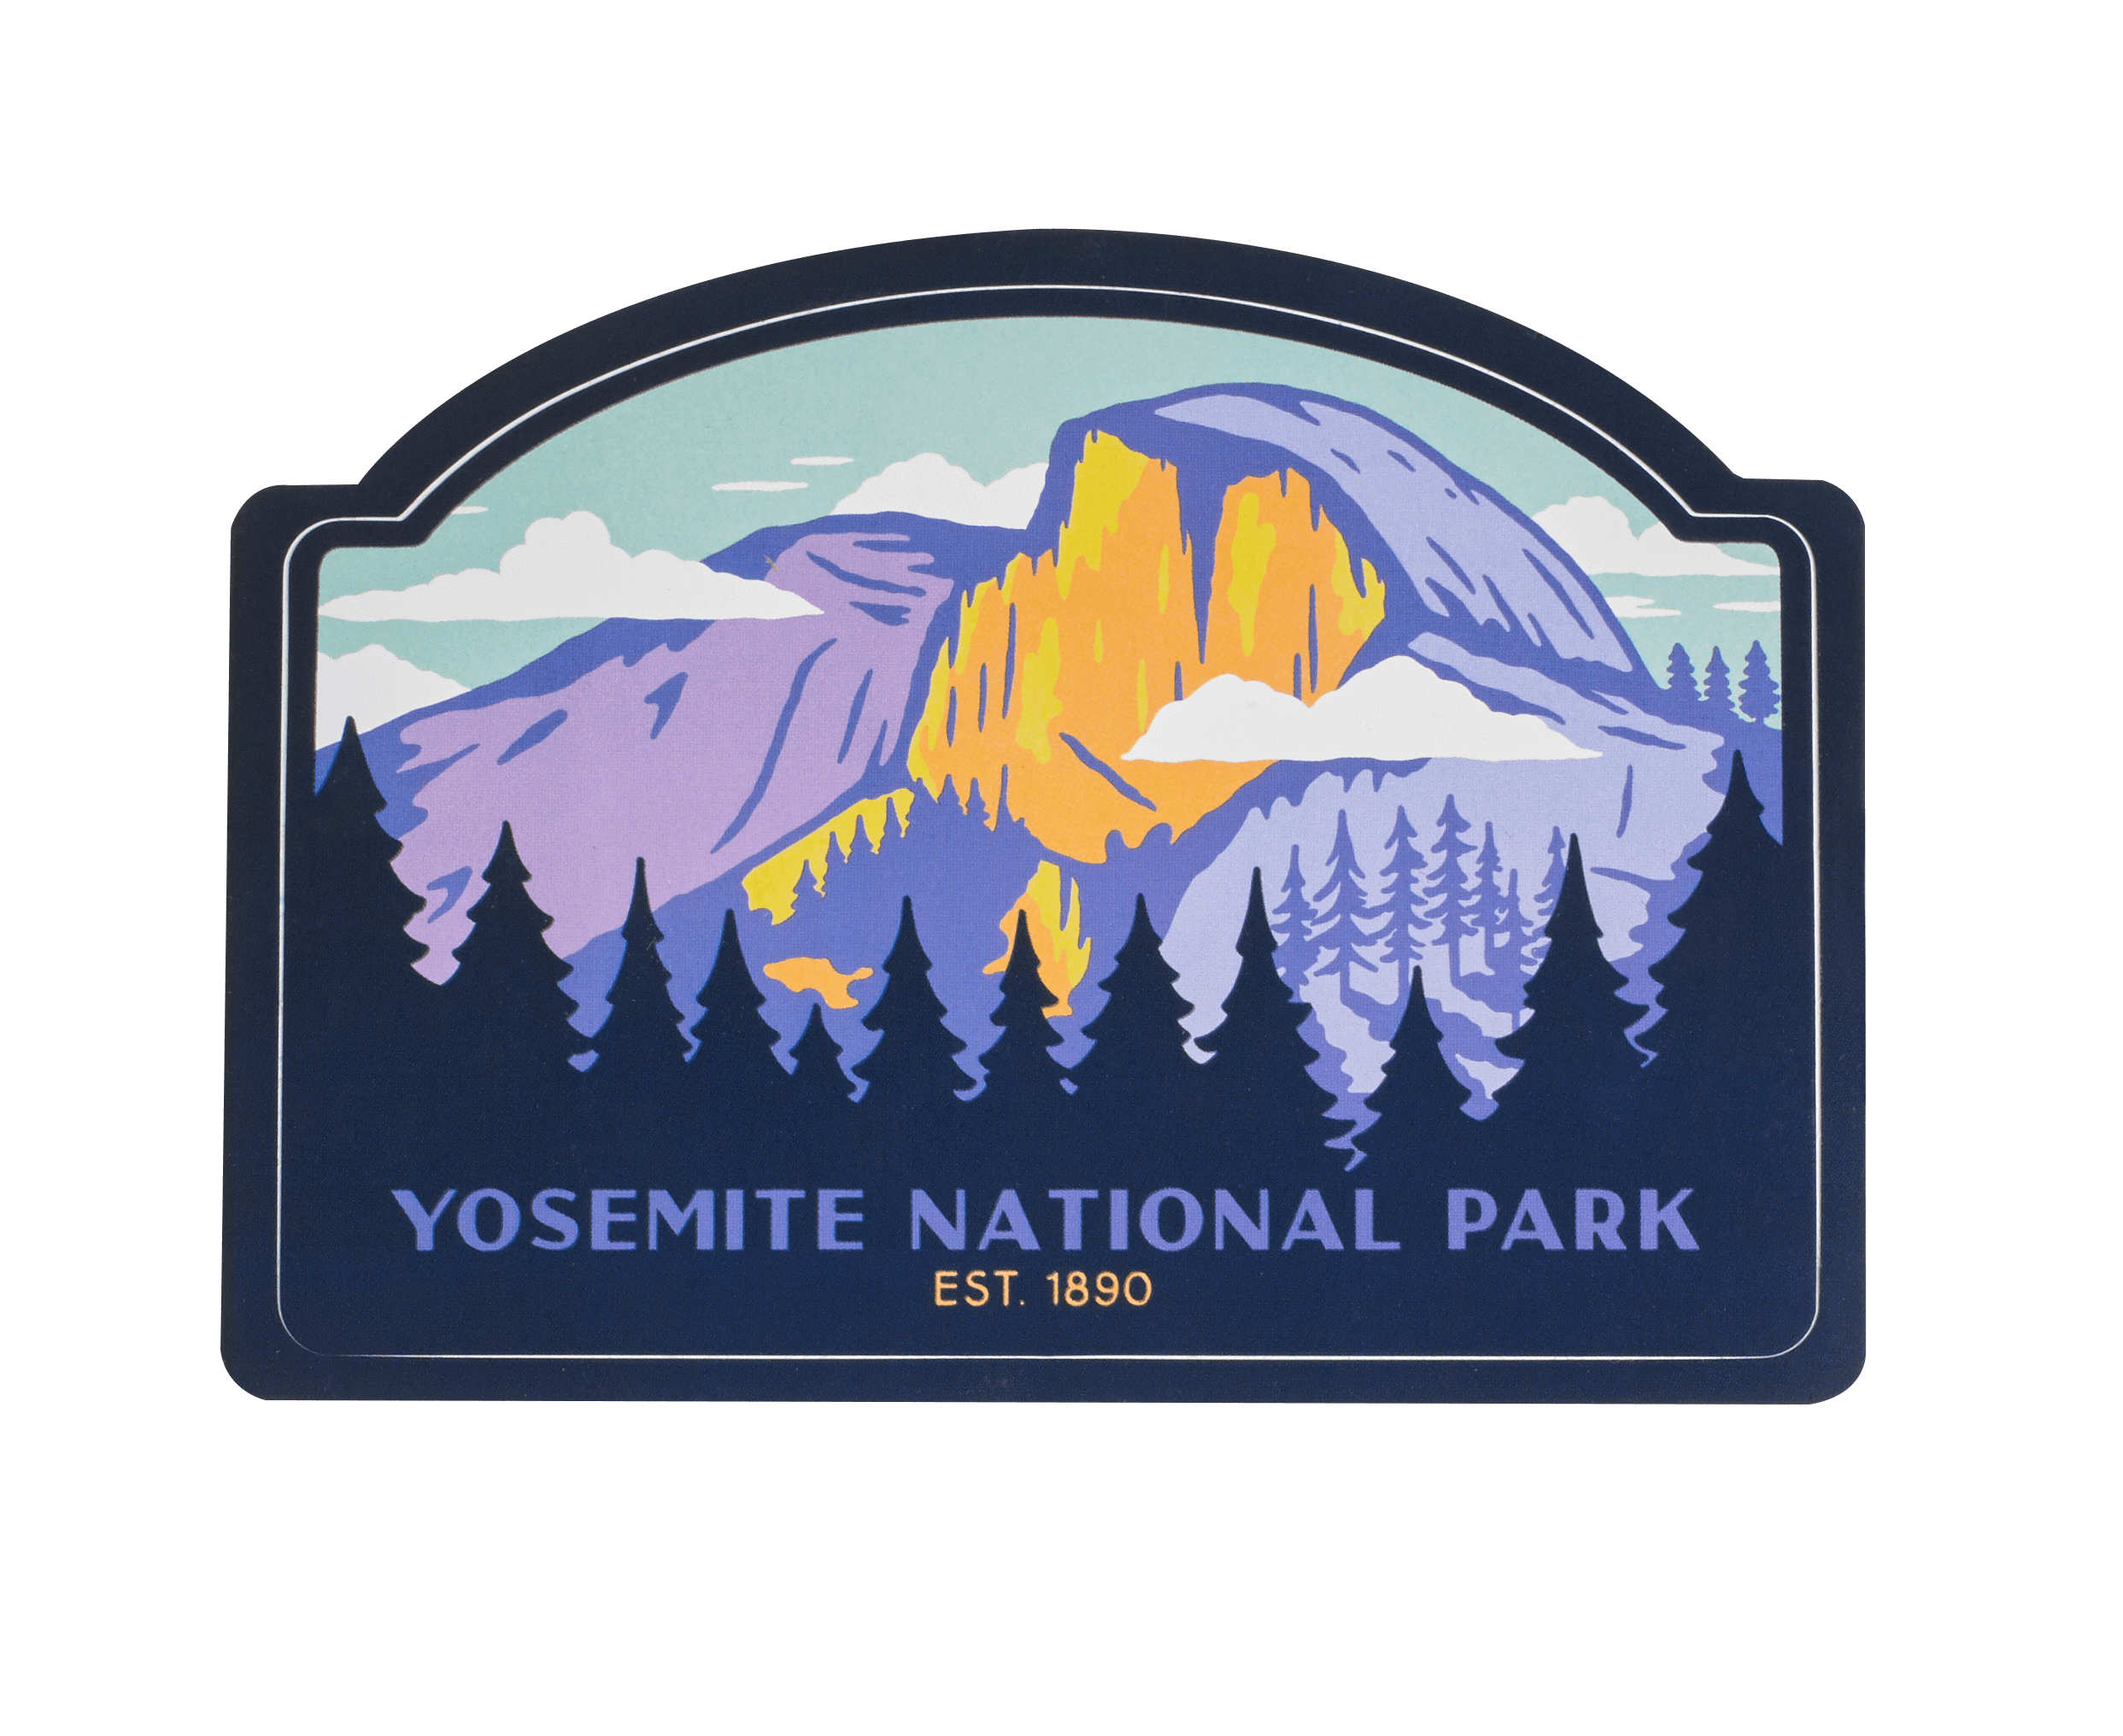 Yosemite National Park Sticker Yosemite National Park Photography Yosemite Art National Parks